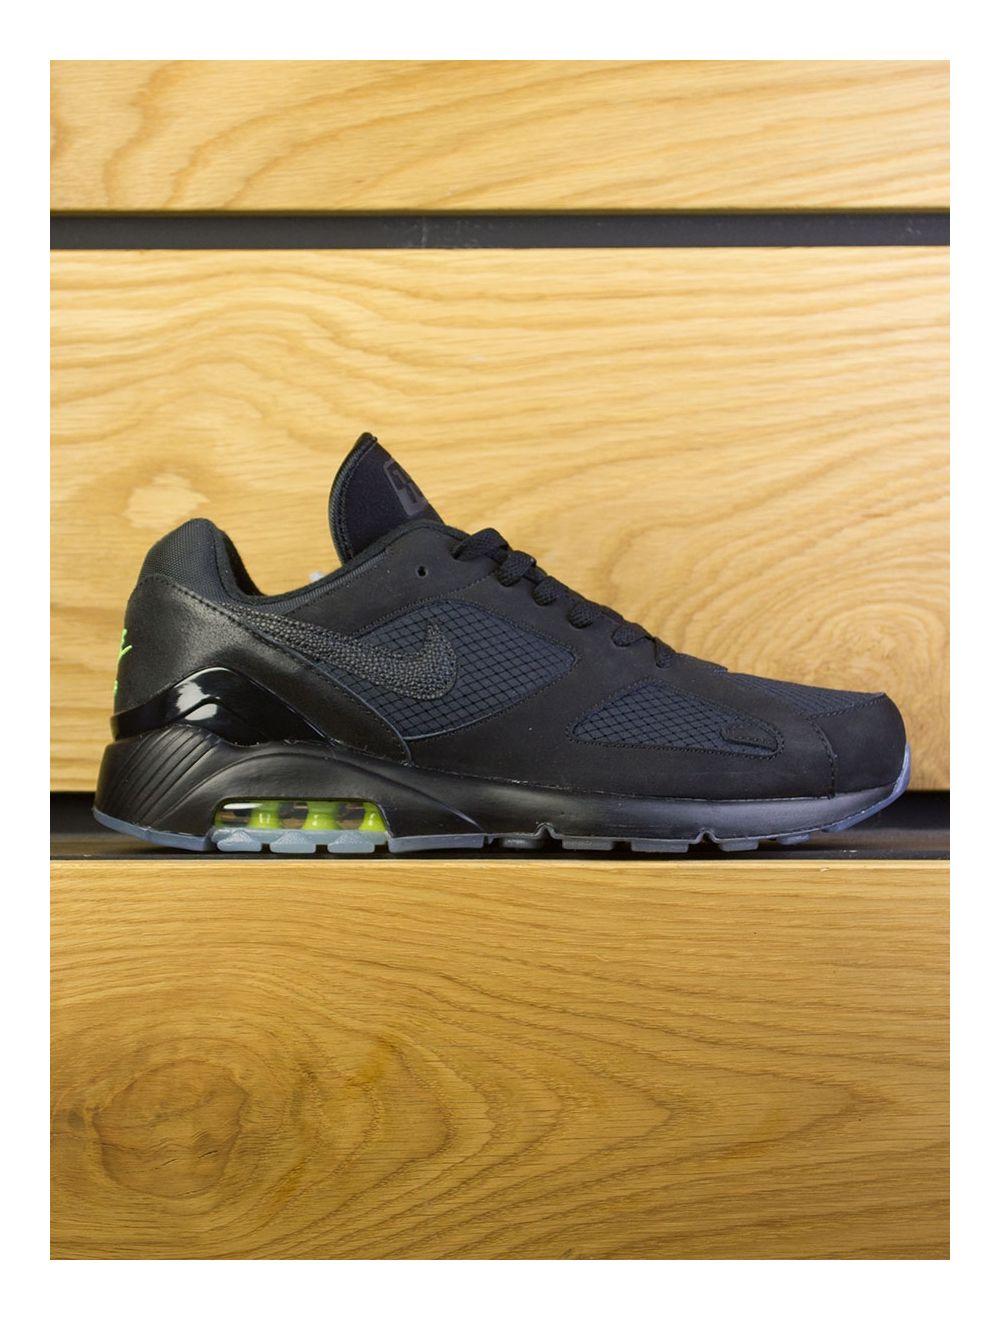 Nike Air Max 180 Night Ops Black Black Volt